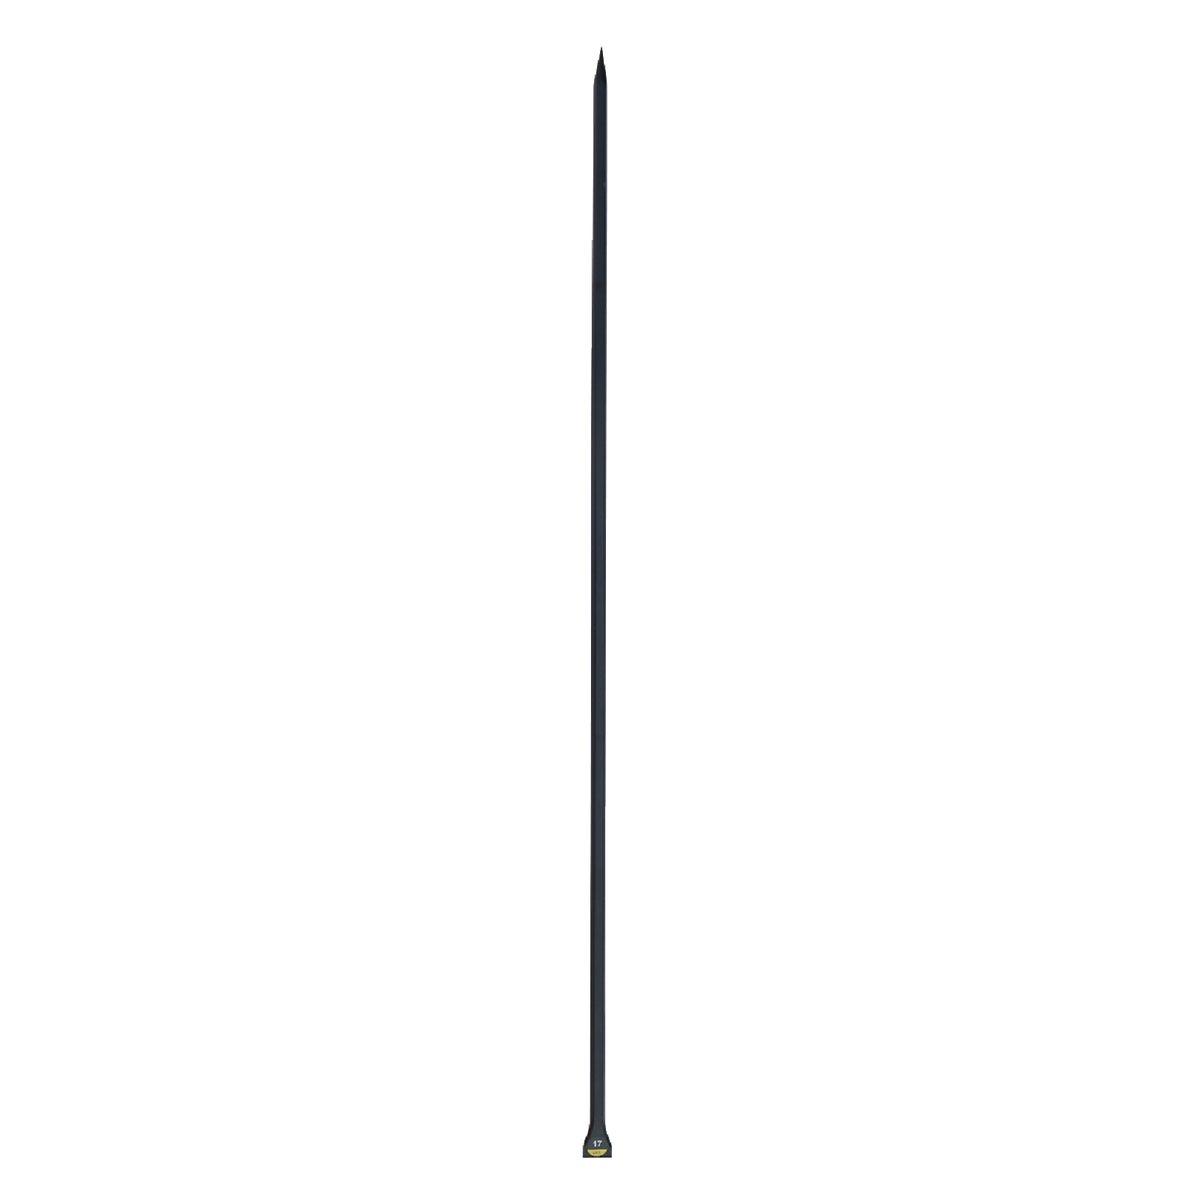 1X1X72 SAN ANGELO BAR - BAP175-C by Truper Herramientas